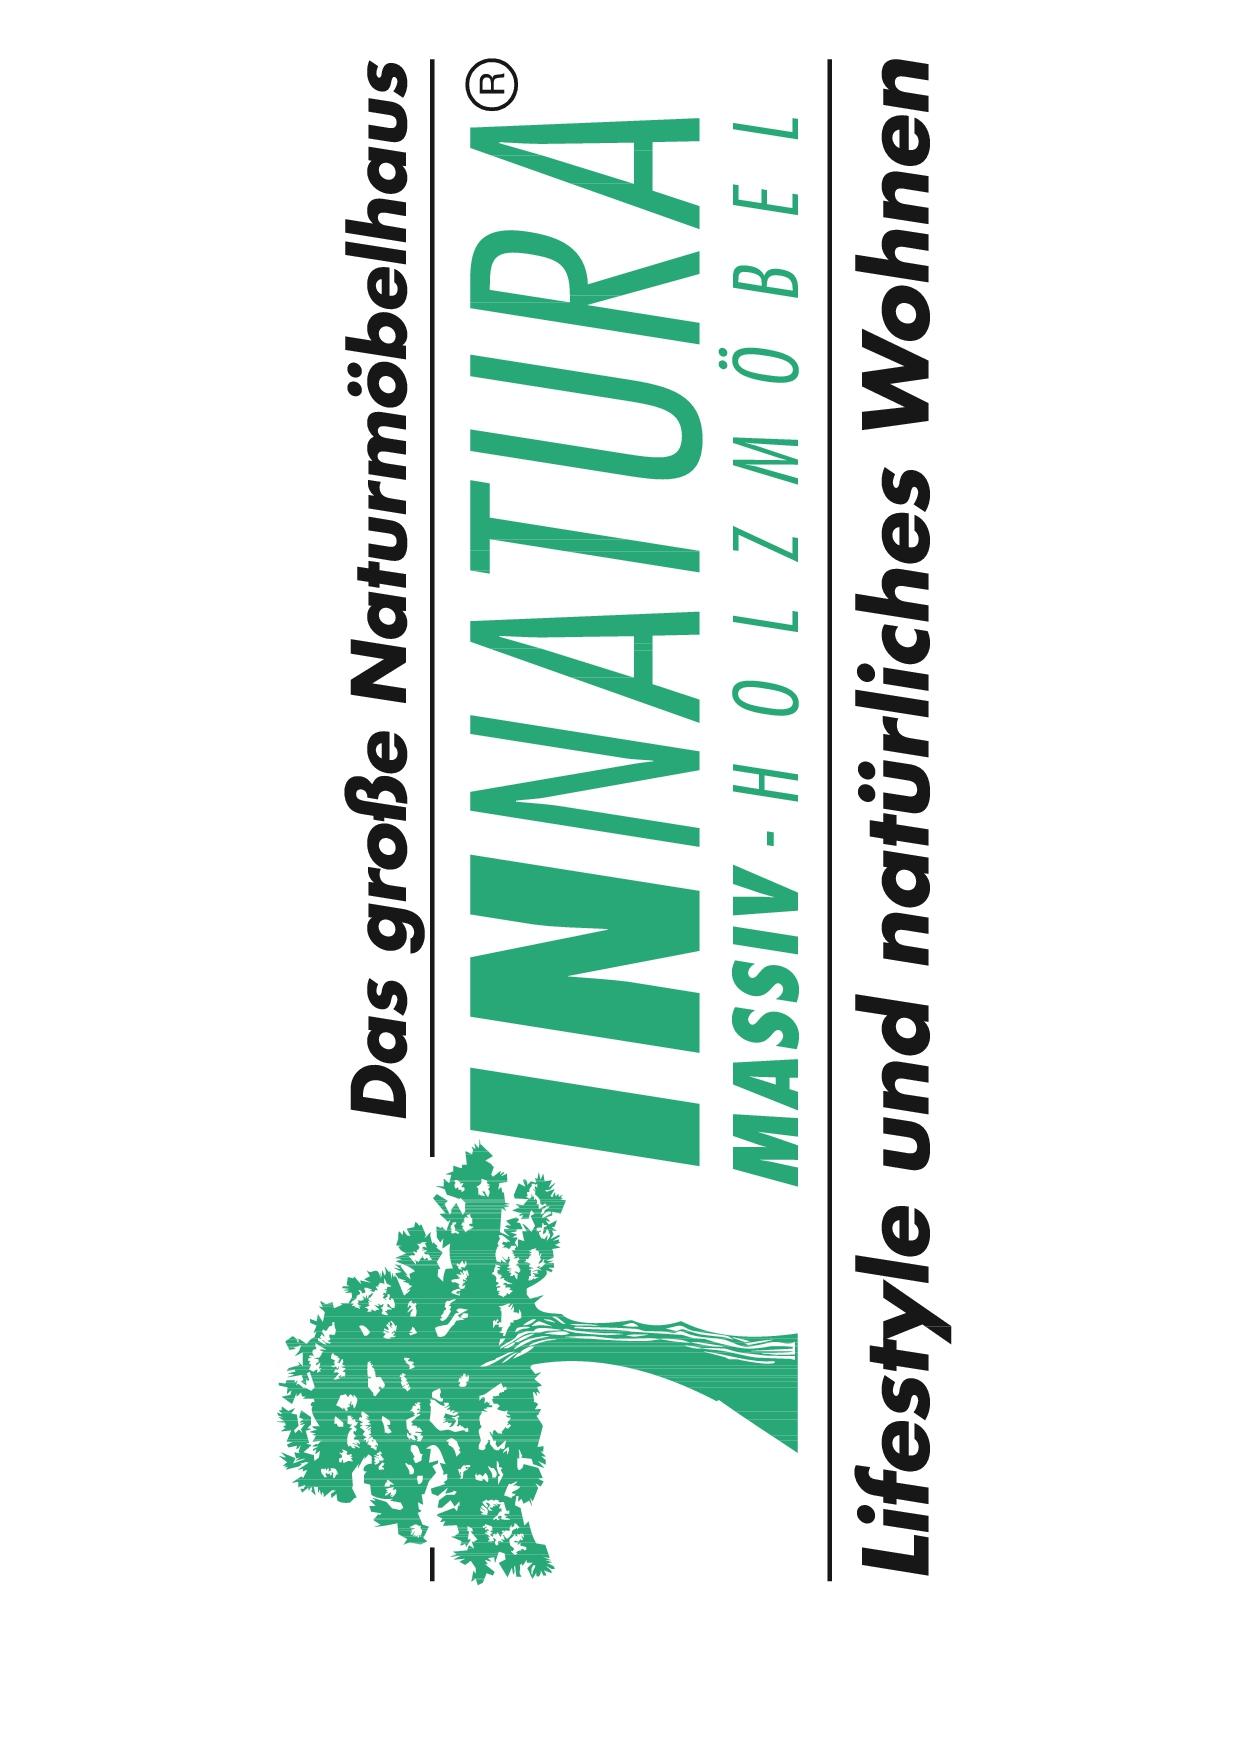 innatura-massiv-holzmoebel-gmbh-hochheim logo